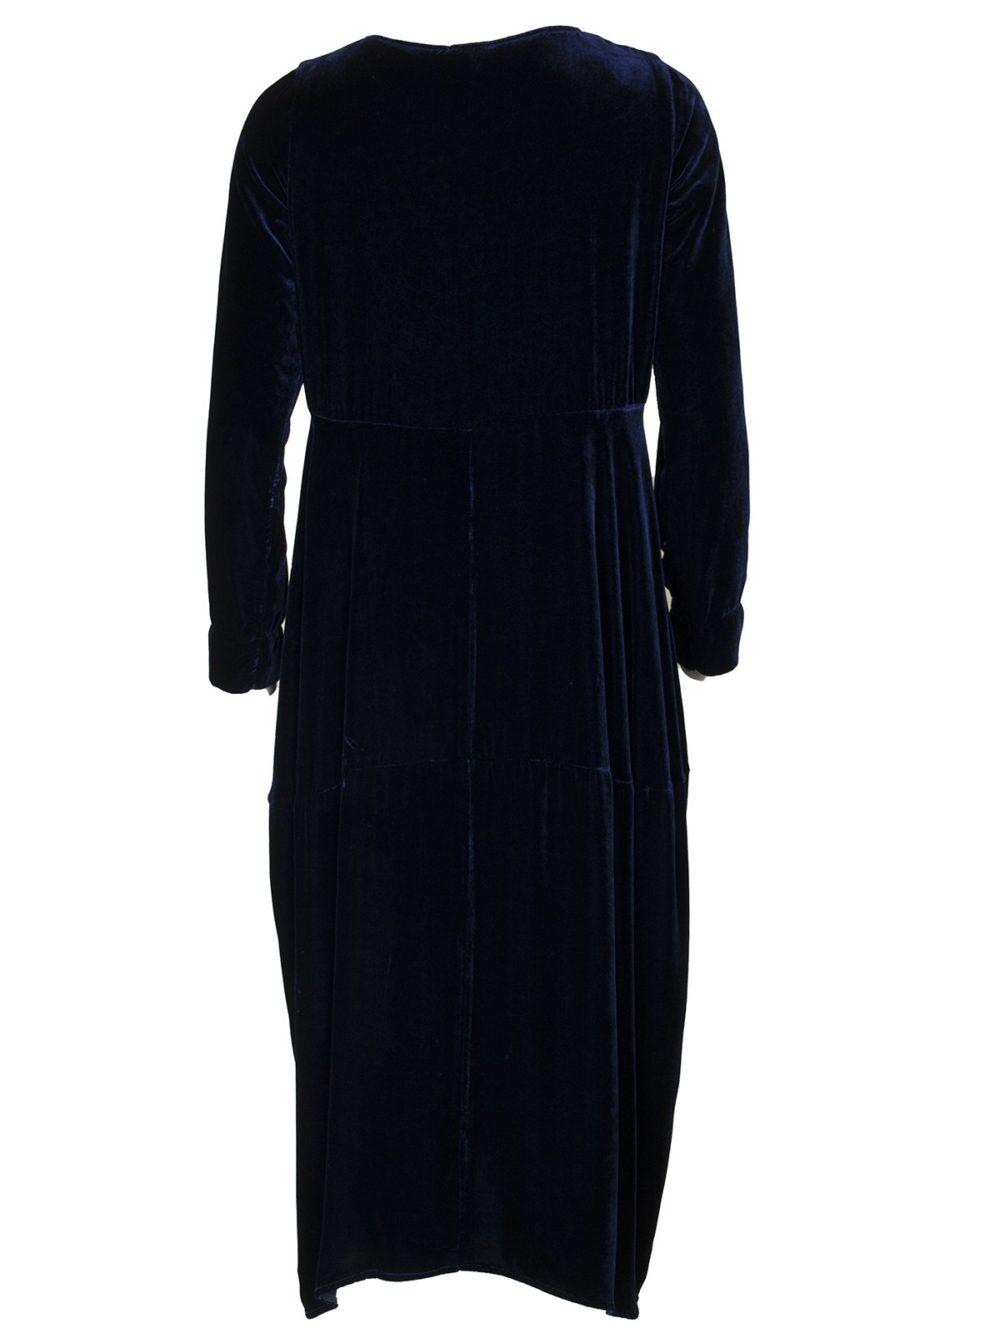 Dress 9405-XN Grizas Katie Kerr Women's Clothing